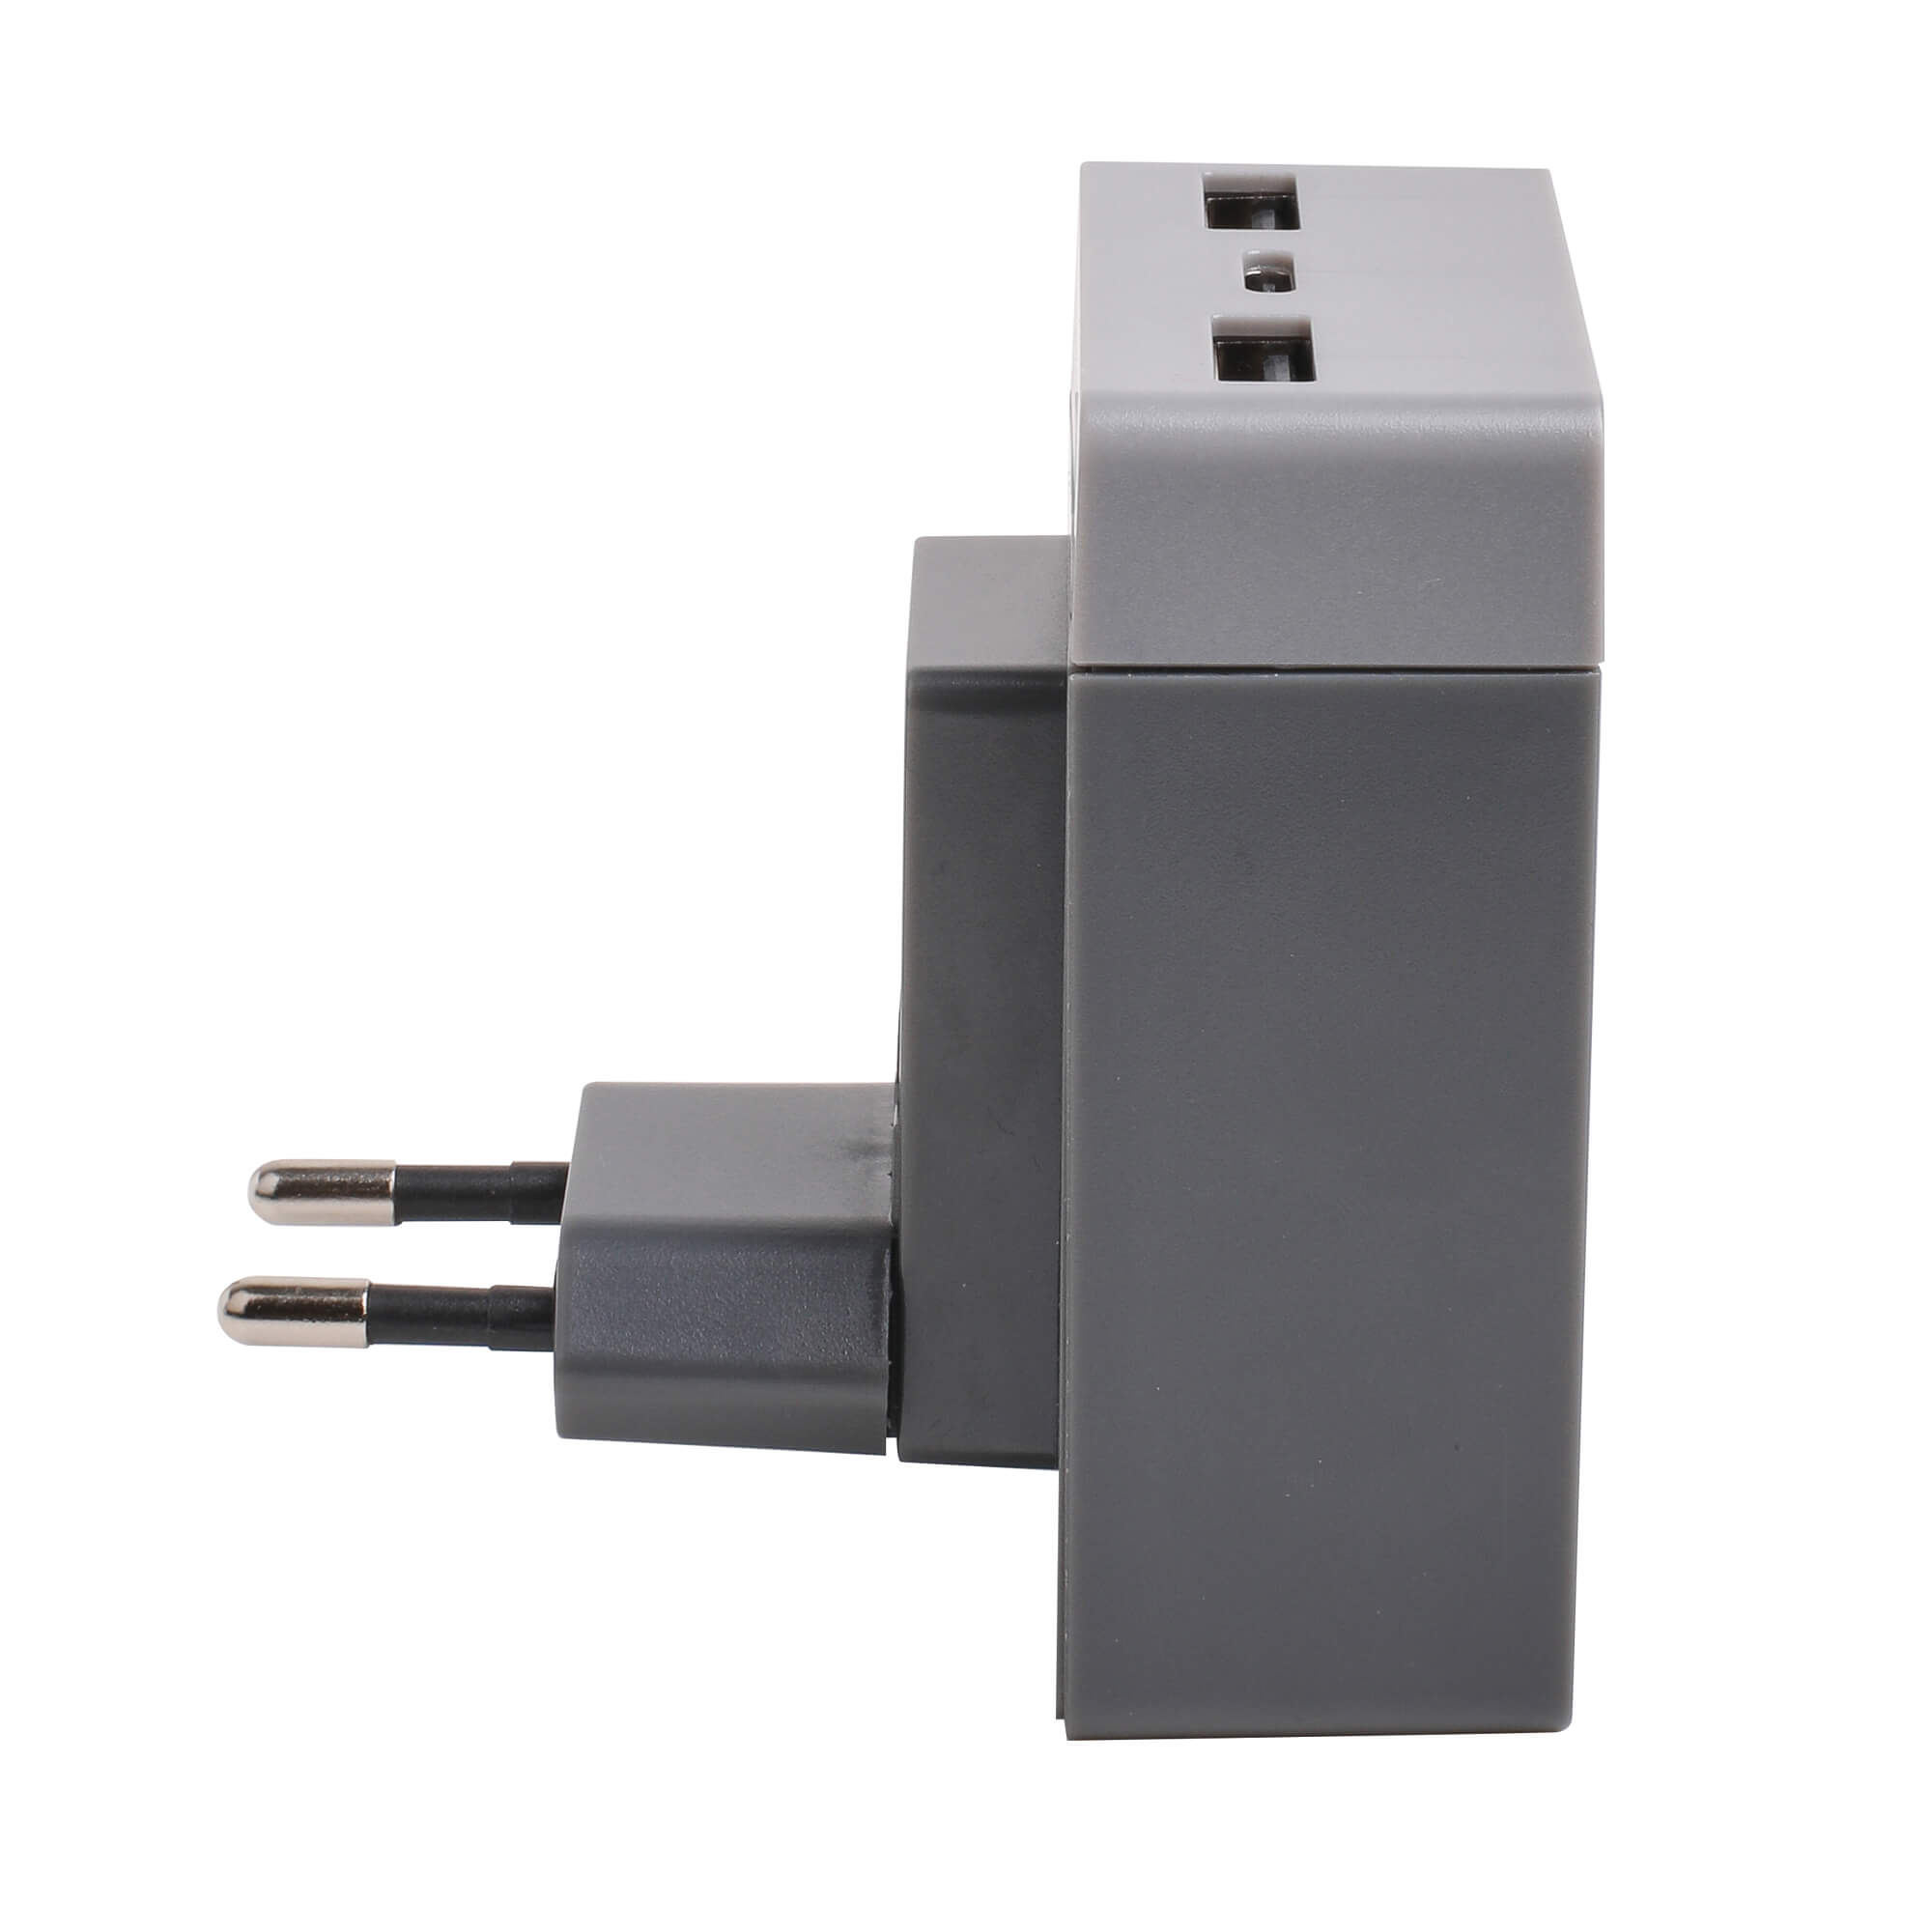 Charger 220V 1xUSB C PD 2xUSB A 2.4A PD 30W 3.0 For MobilPCMac Total 45W